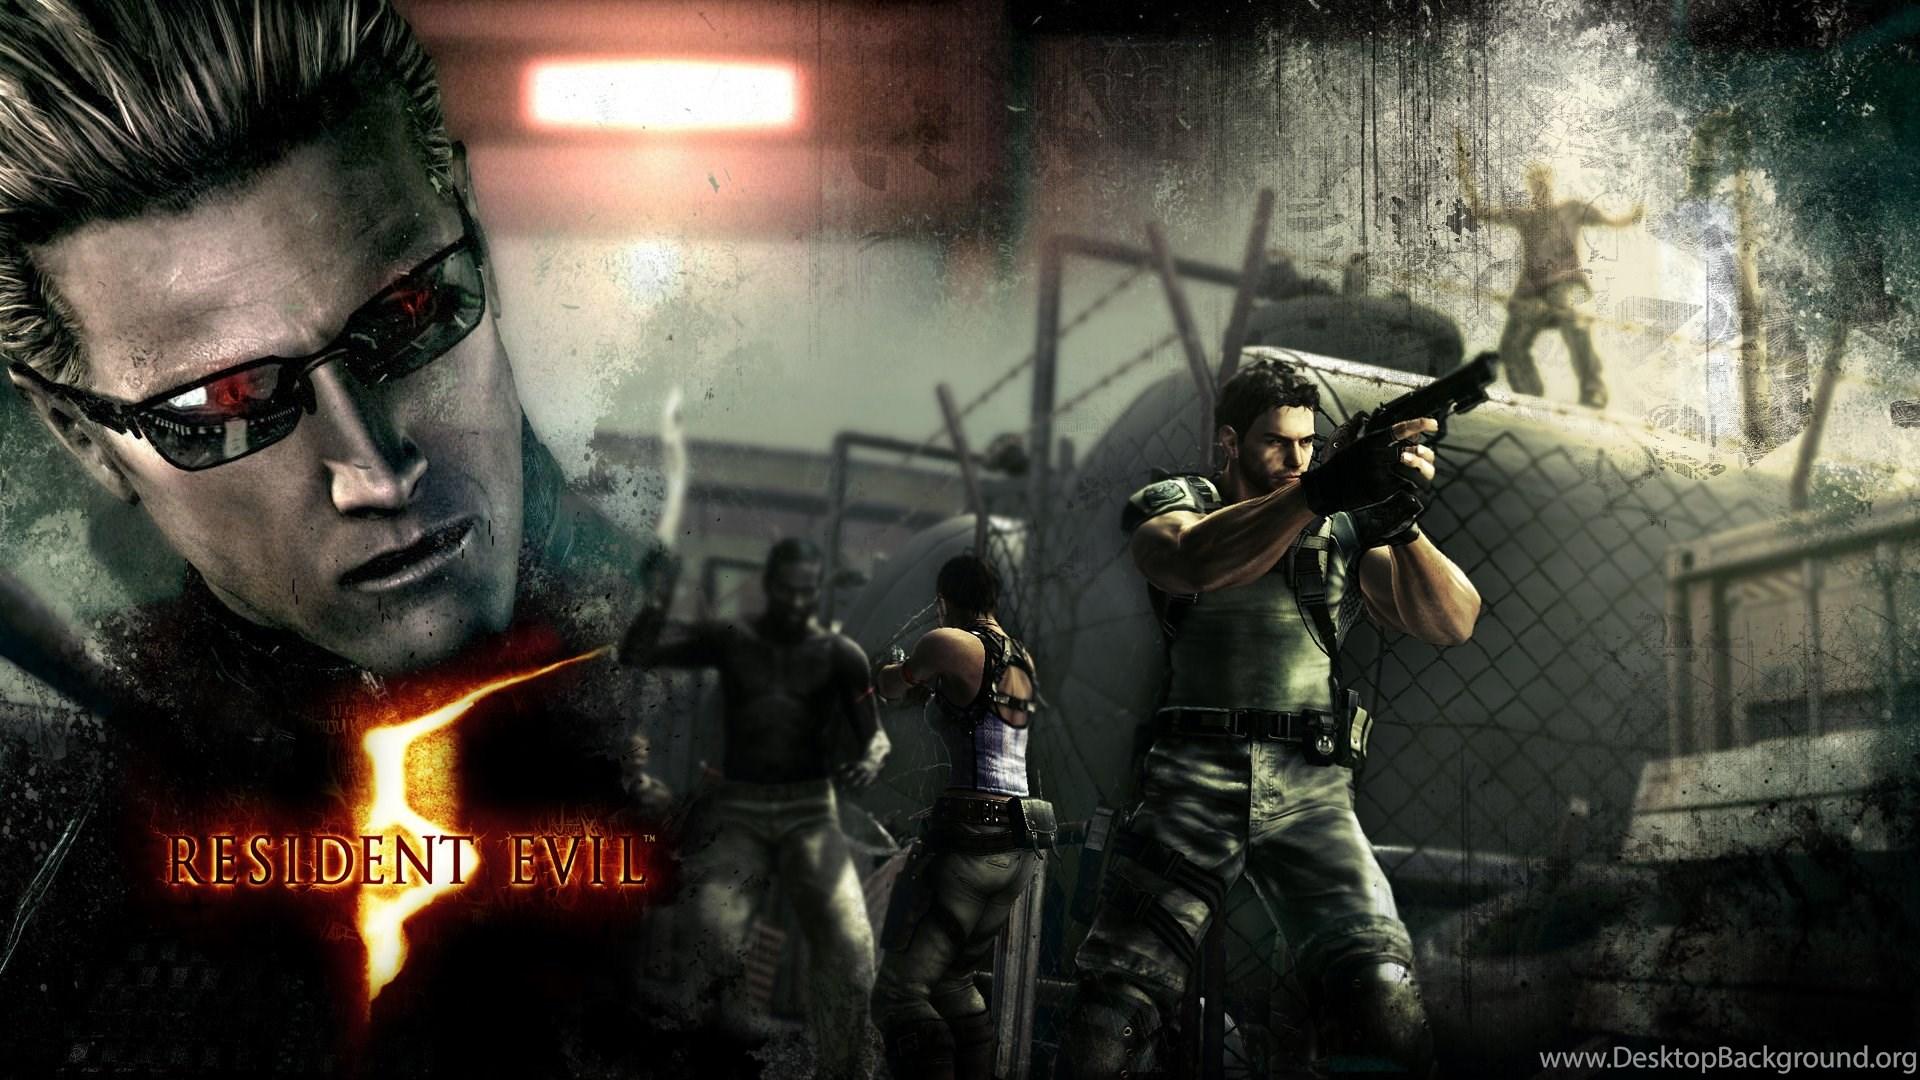 Resident Evil 5 Hd Wallpapers Wallpapers Zone Desktop Background